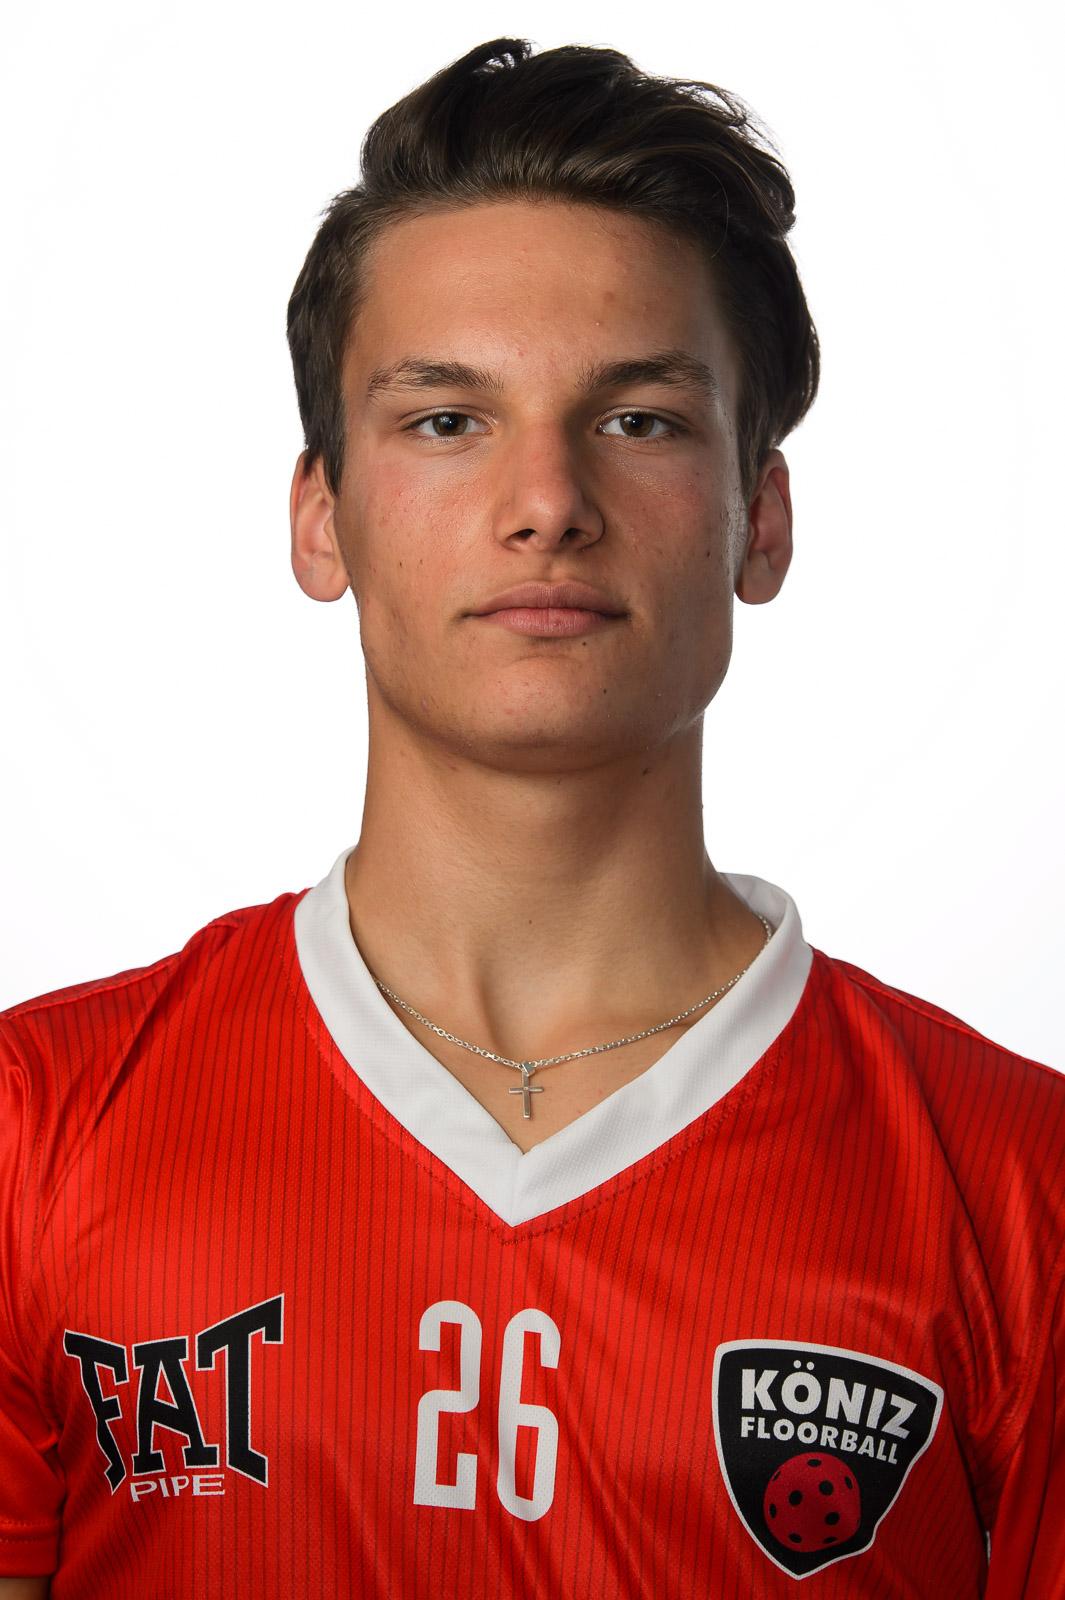 #26 Lukas Münger